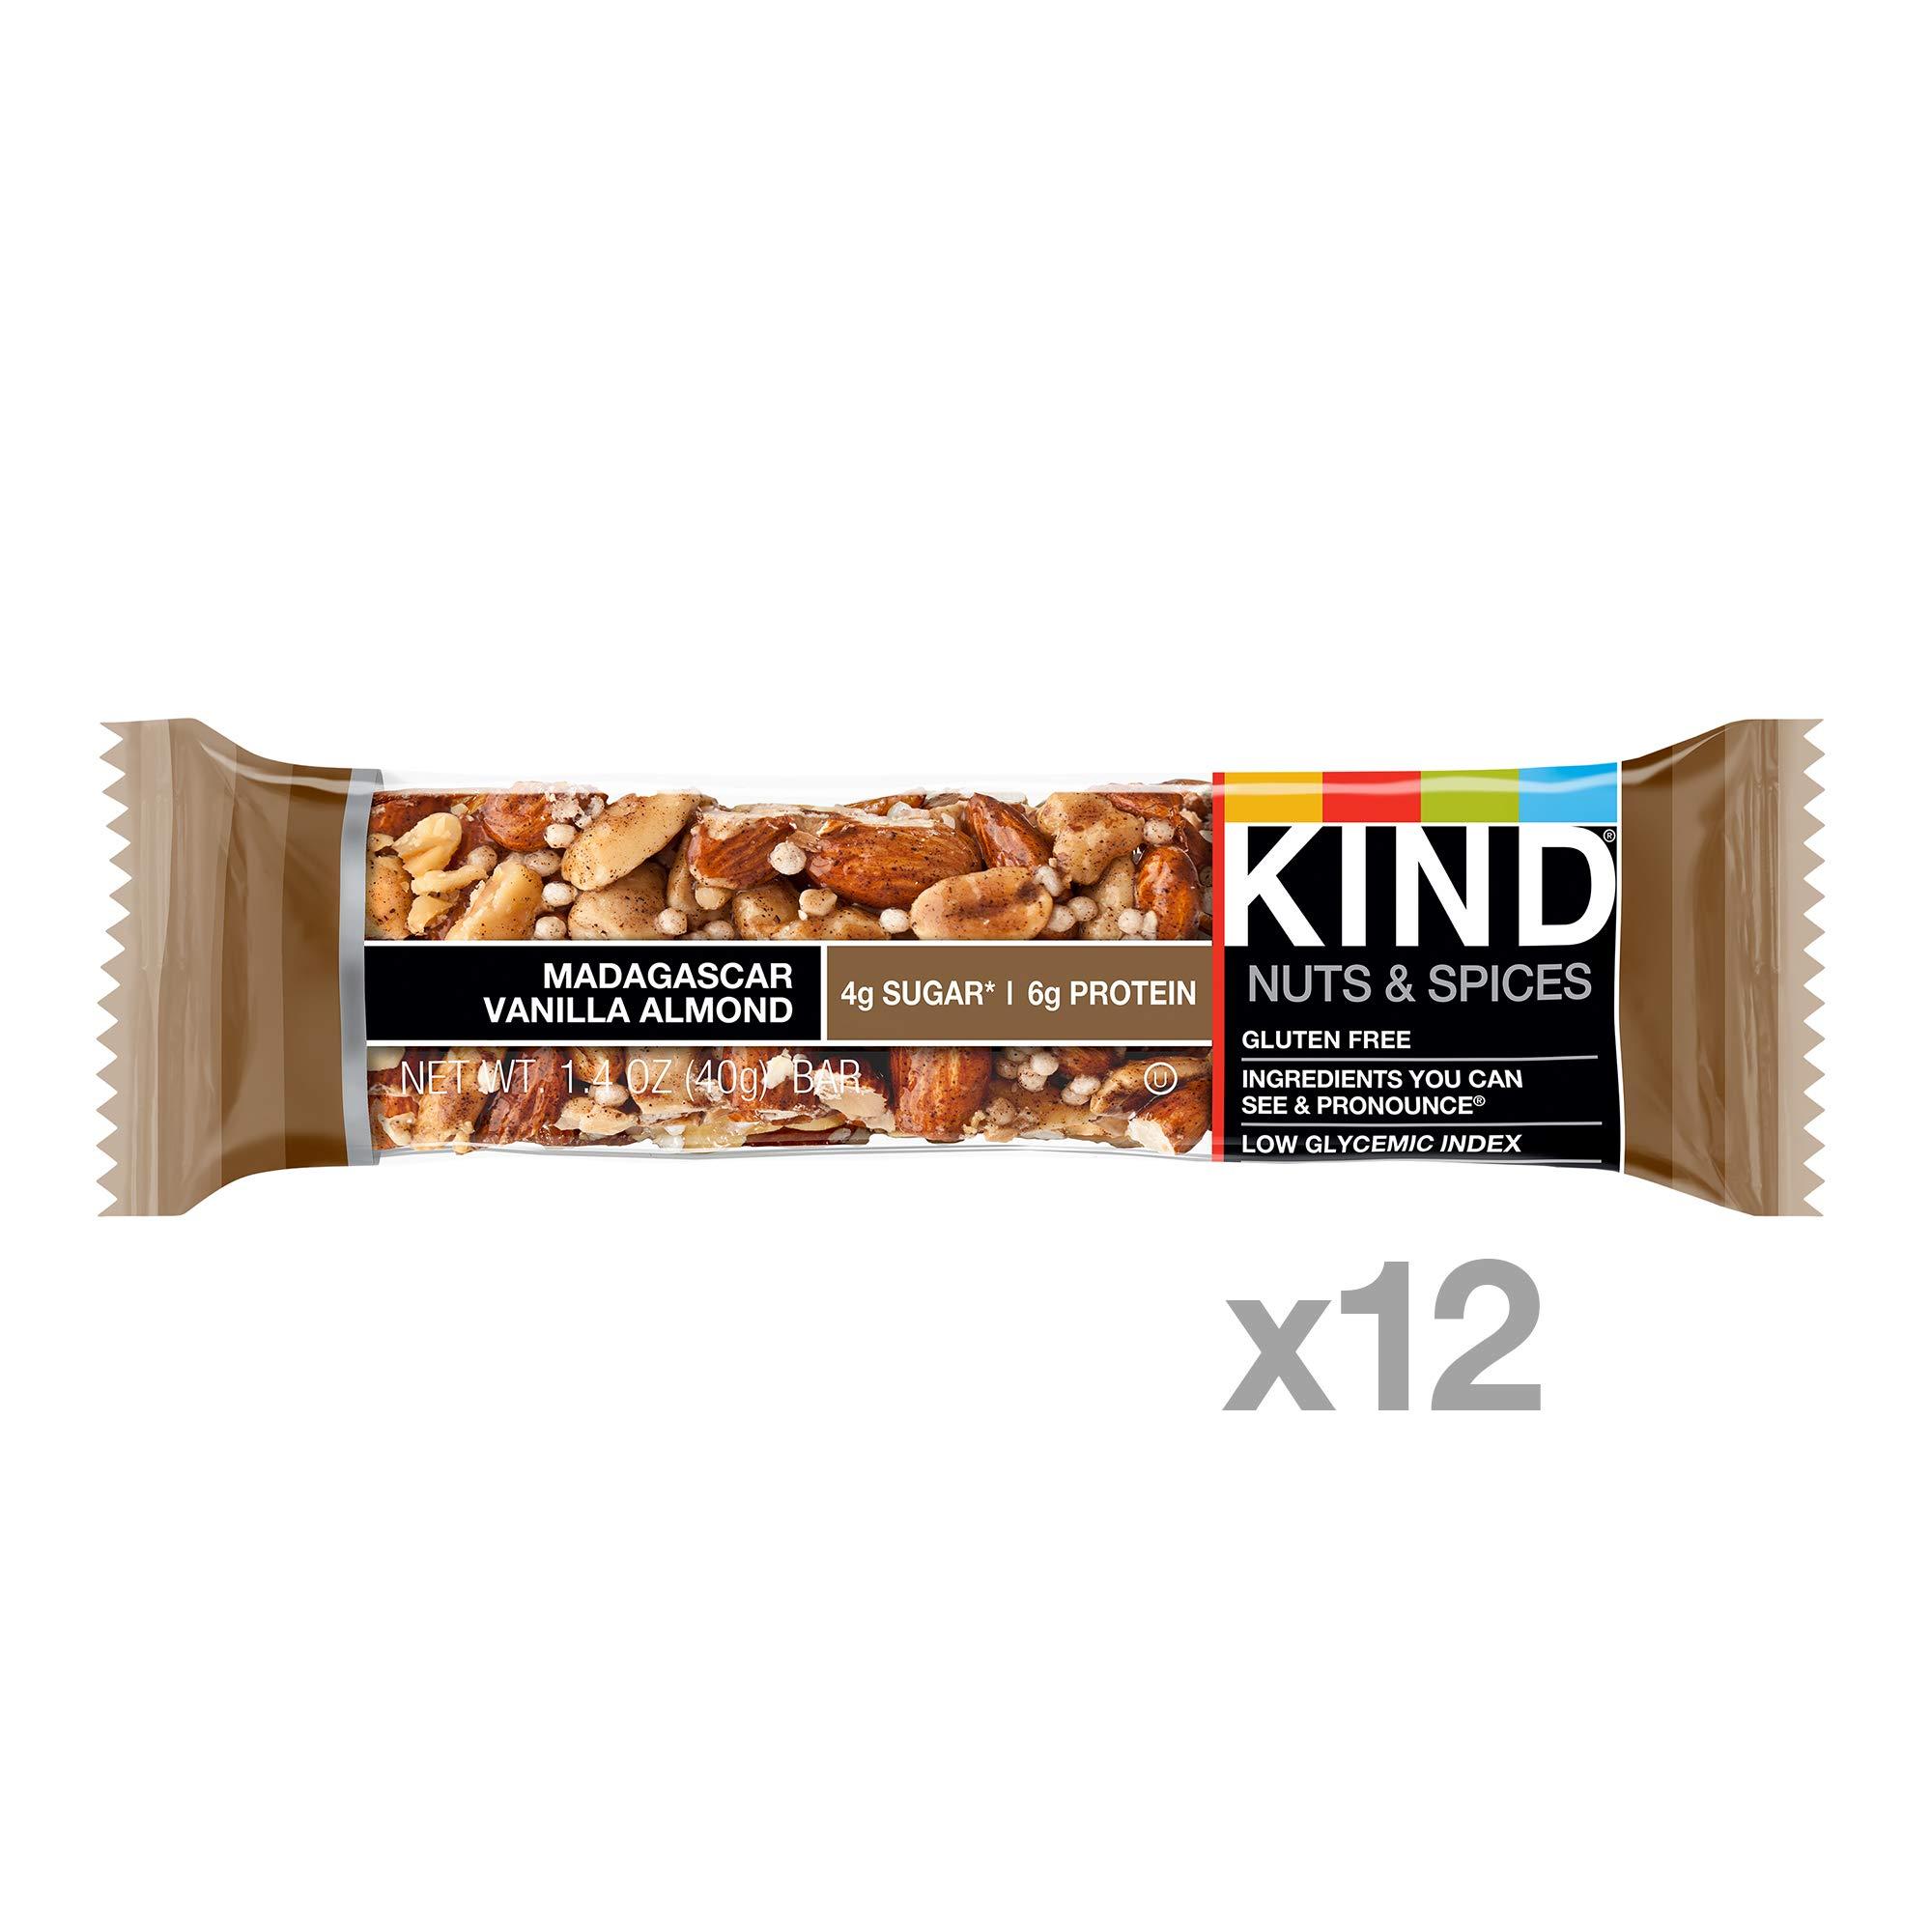 KIND Bars, Madagascar Vanilla Almond, Gluten Free, Low Sugar, 1.4oz, 12 Count by KIND (Image #2)